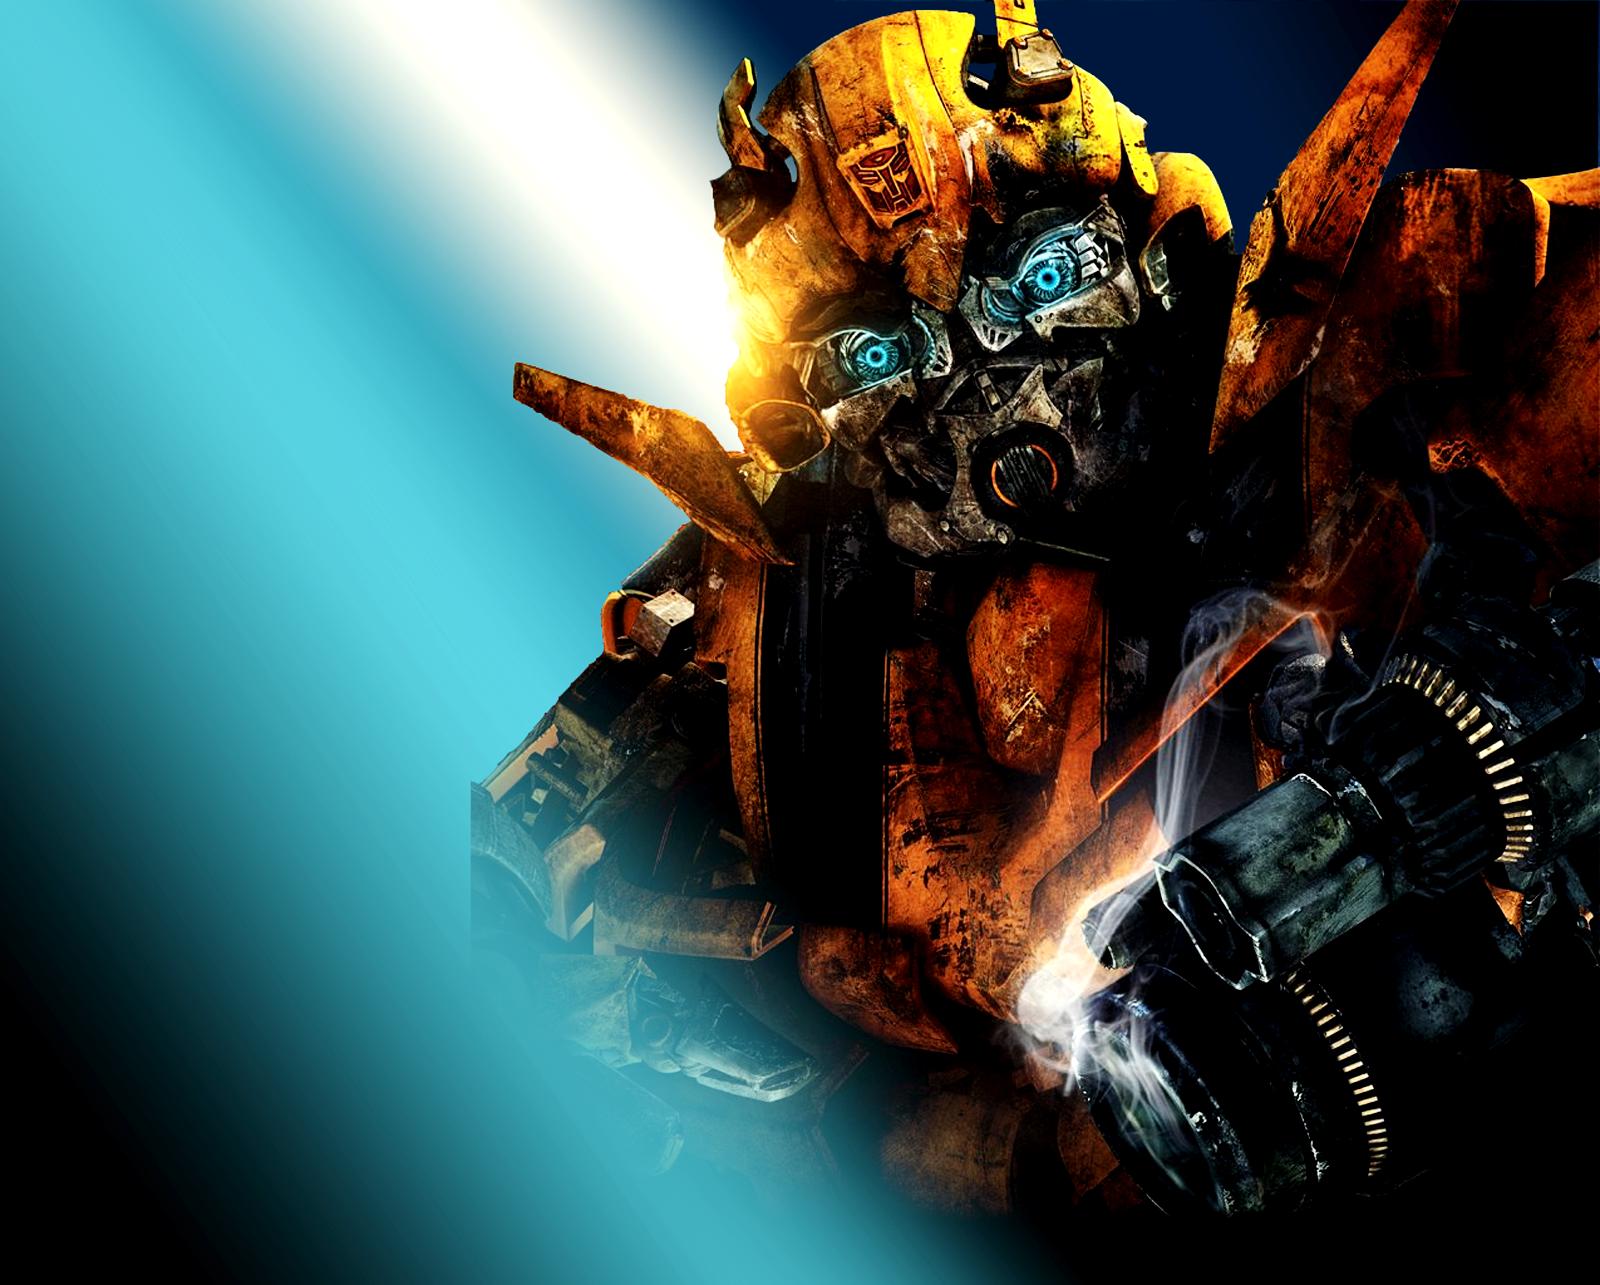 67 Bumblebee Transformers Wallpaper On Wallpapersafari